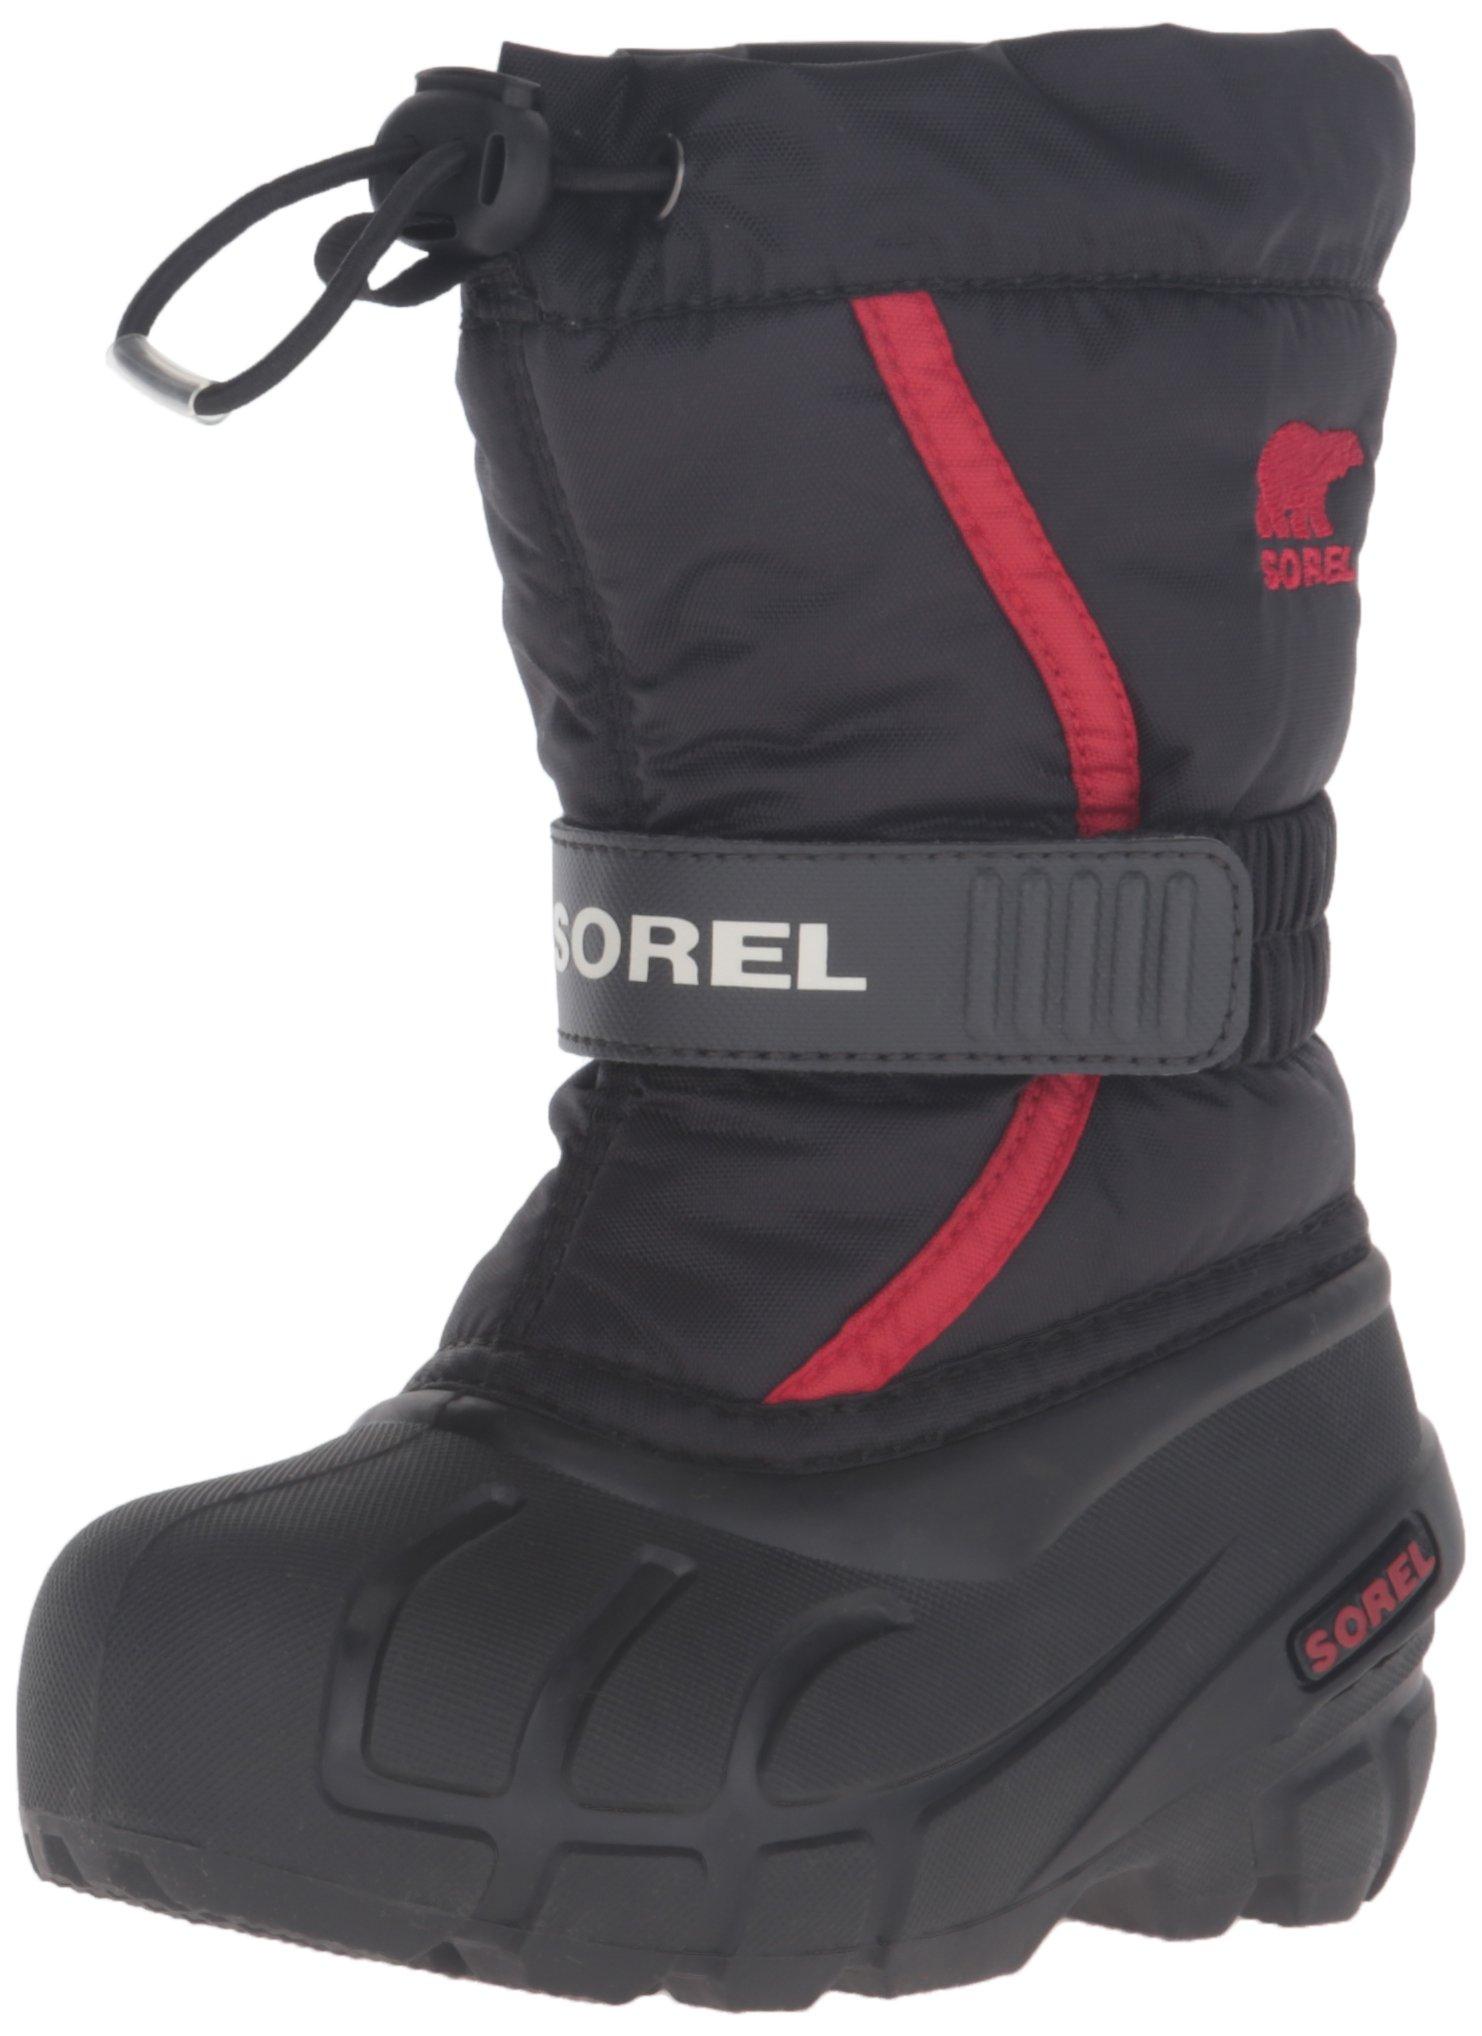 Sorel Childrens Flurry-K Snow Boot, Black/Bright Red, 11 M US Little Kid